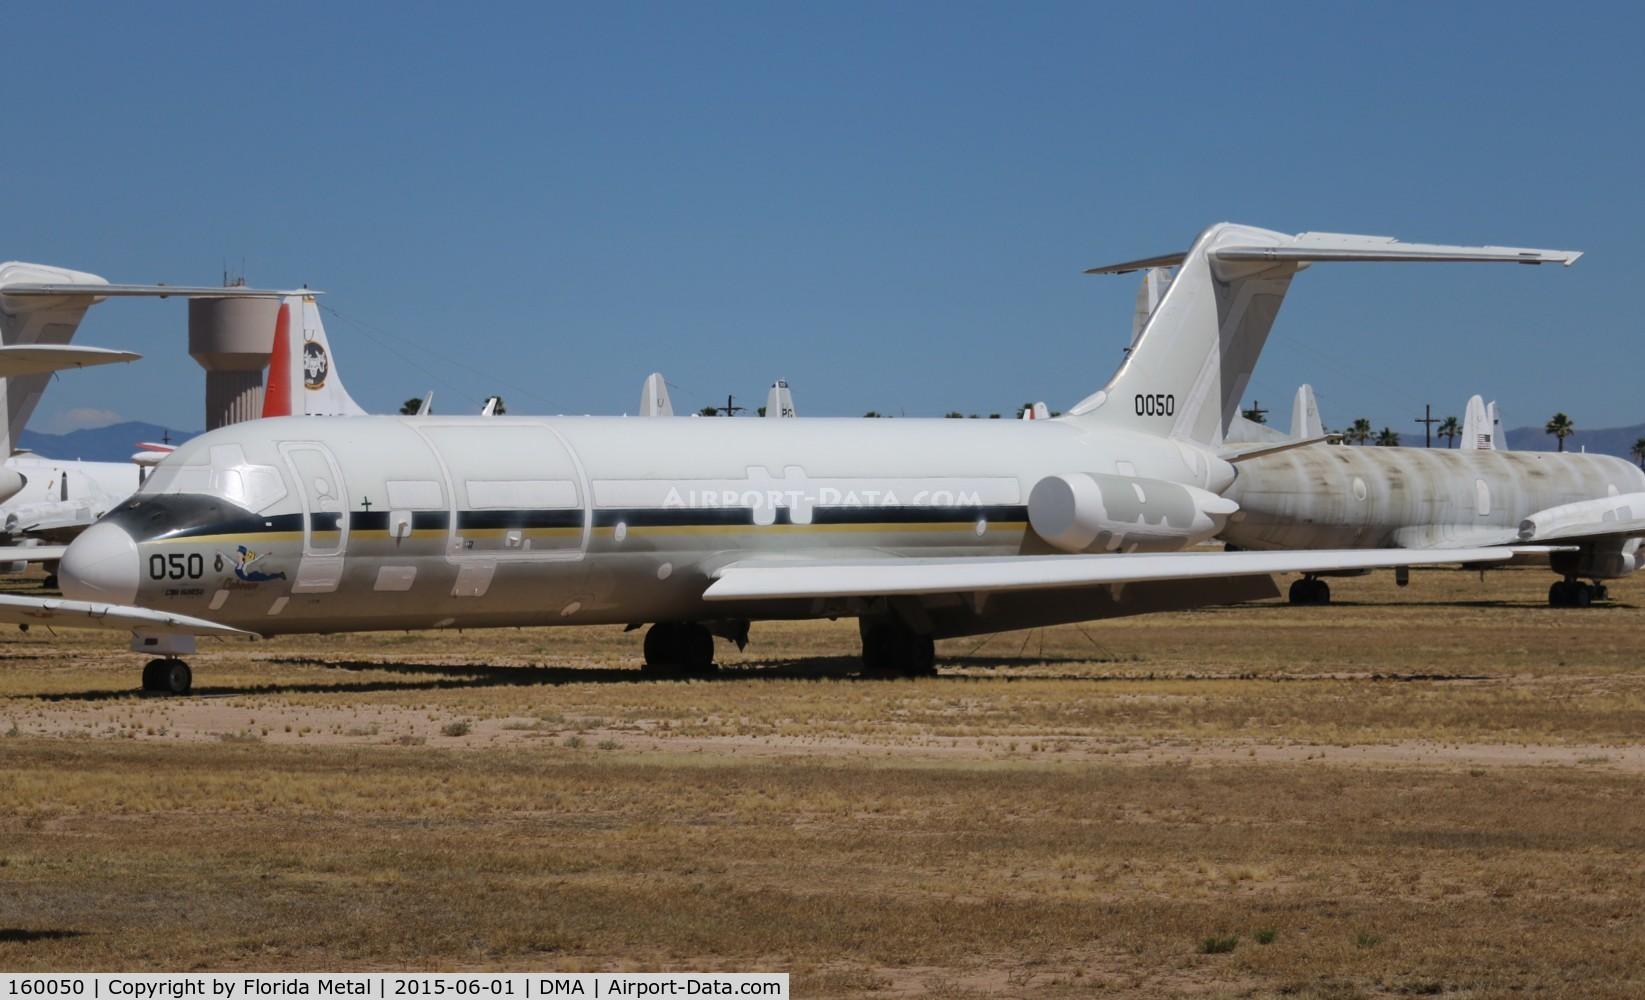 160050, 1975 McDonnell Douglas C-9B Skytrain II C/N 47669, C-9B Skytrain II